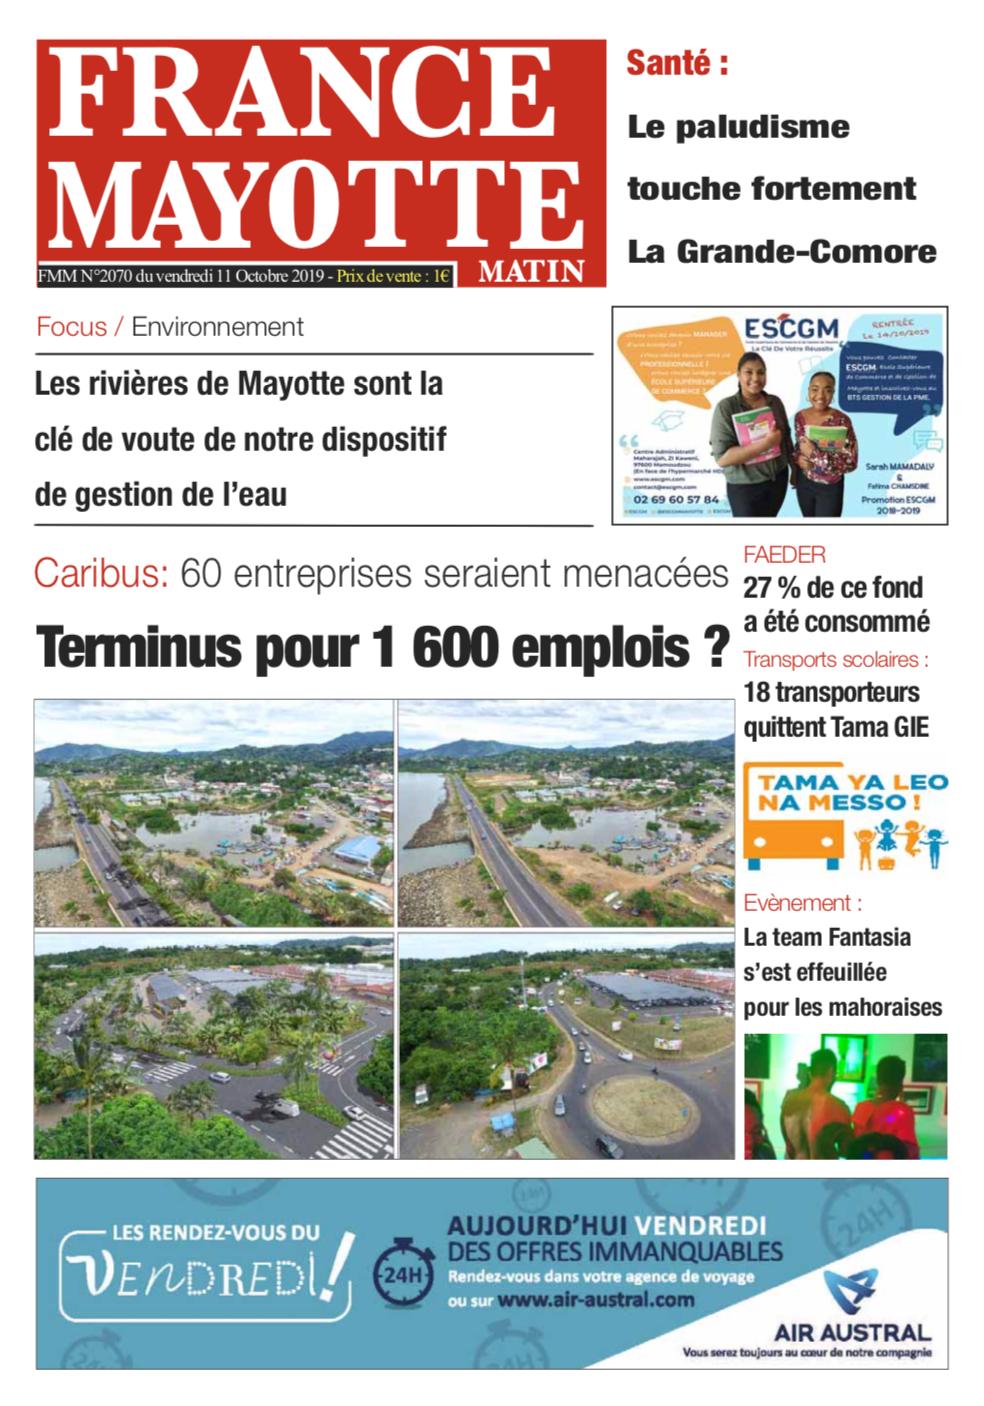 France Mayotte Vendredi 11 octobre 2019